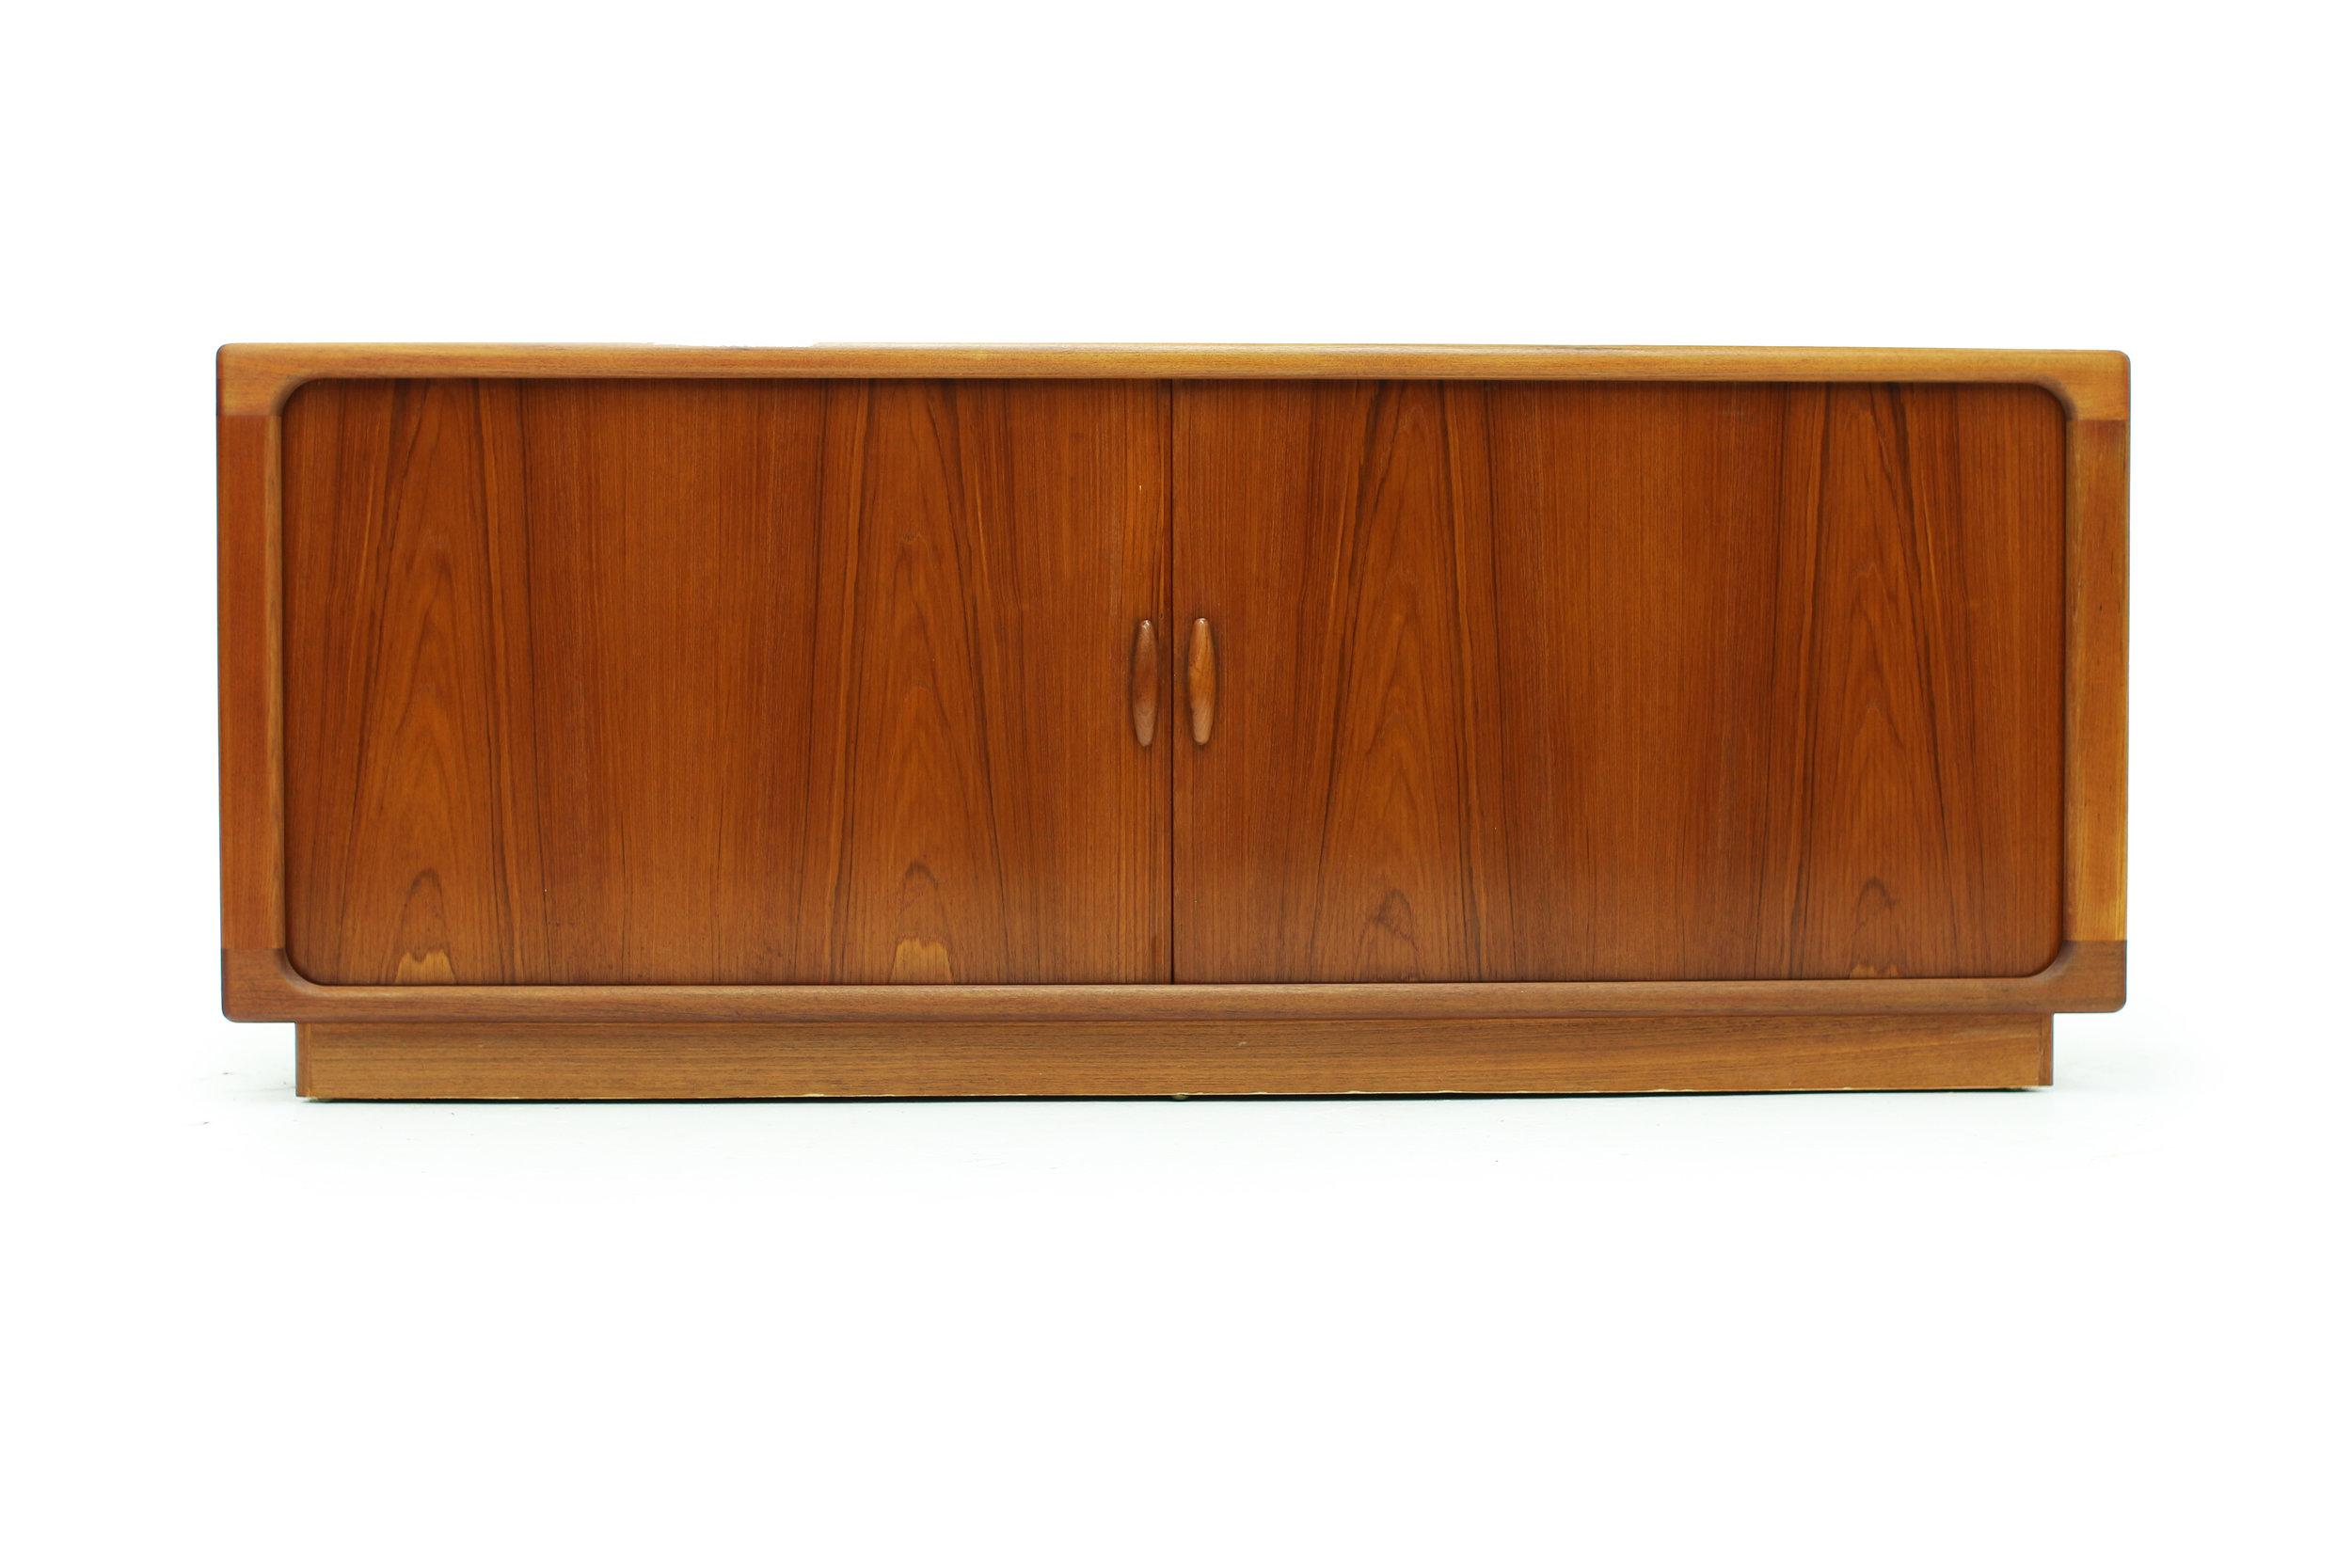 Danish Teak Sideboard with Tambour Doors Made by Dyrlund (1).jpg